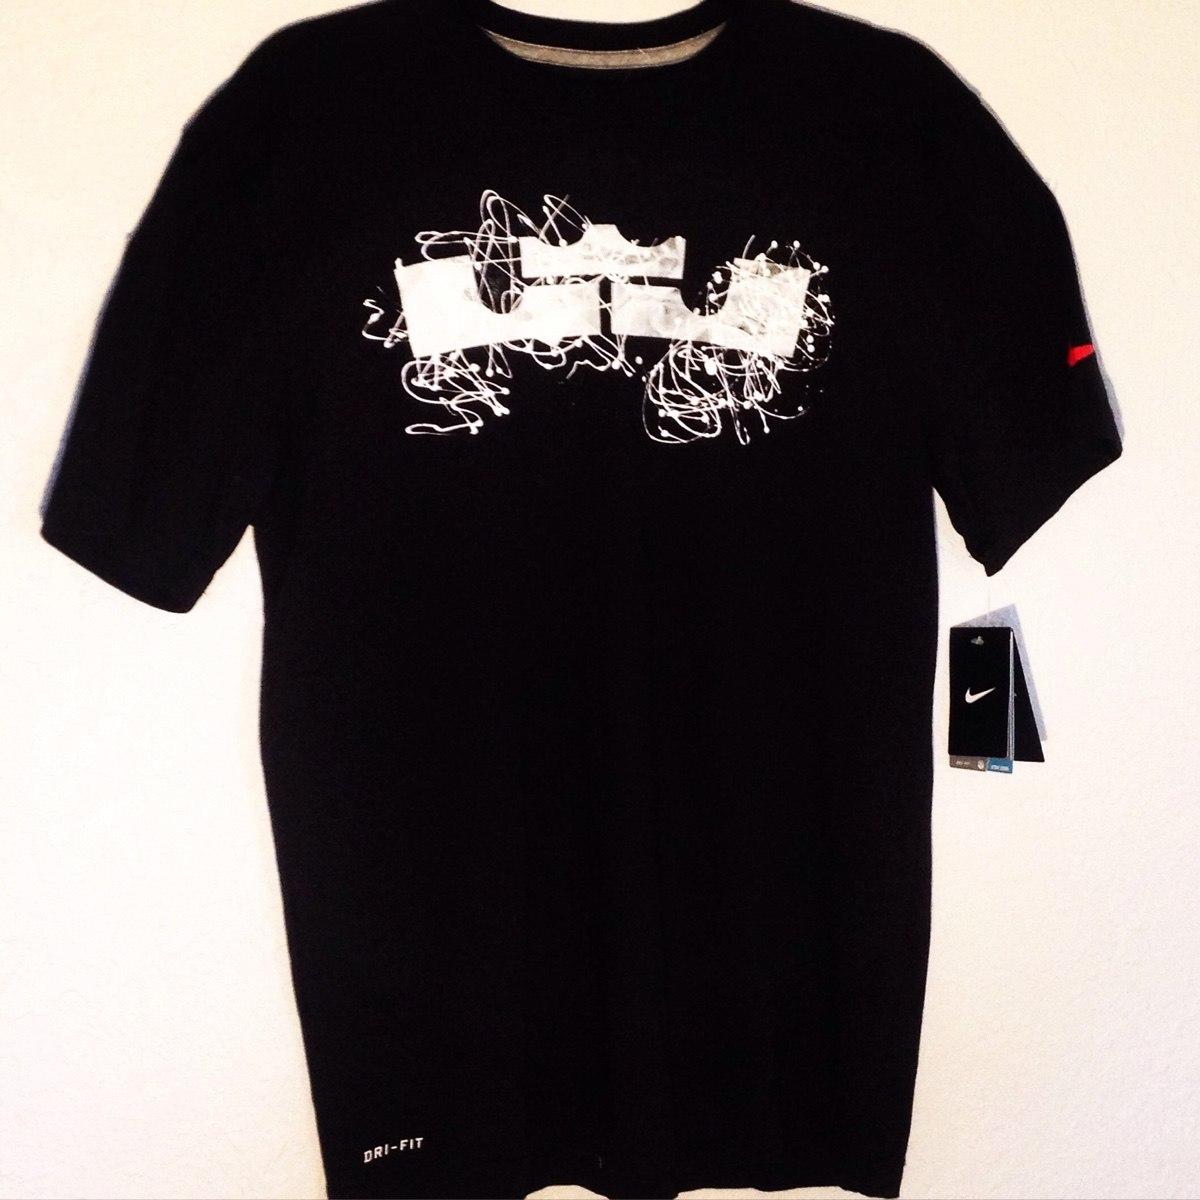 LeBron James camisetas de nike - Santillana CompartirSantillana ... 0f2befba0ec